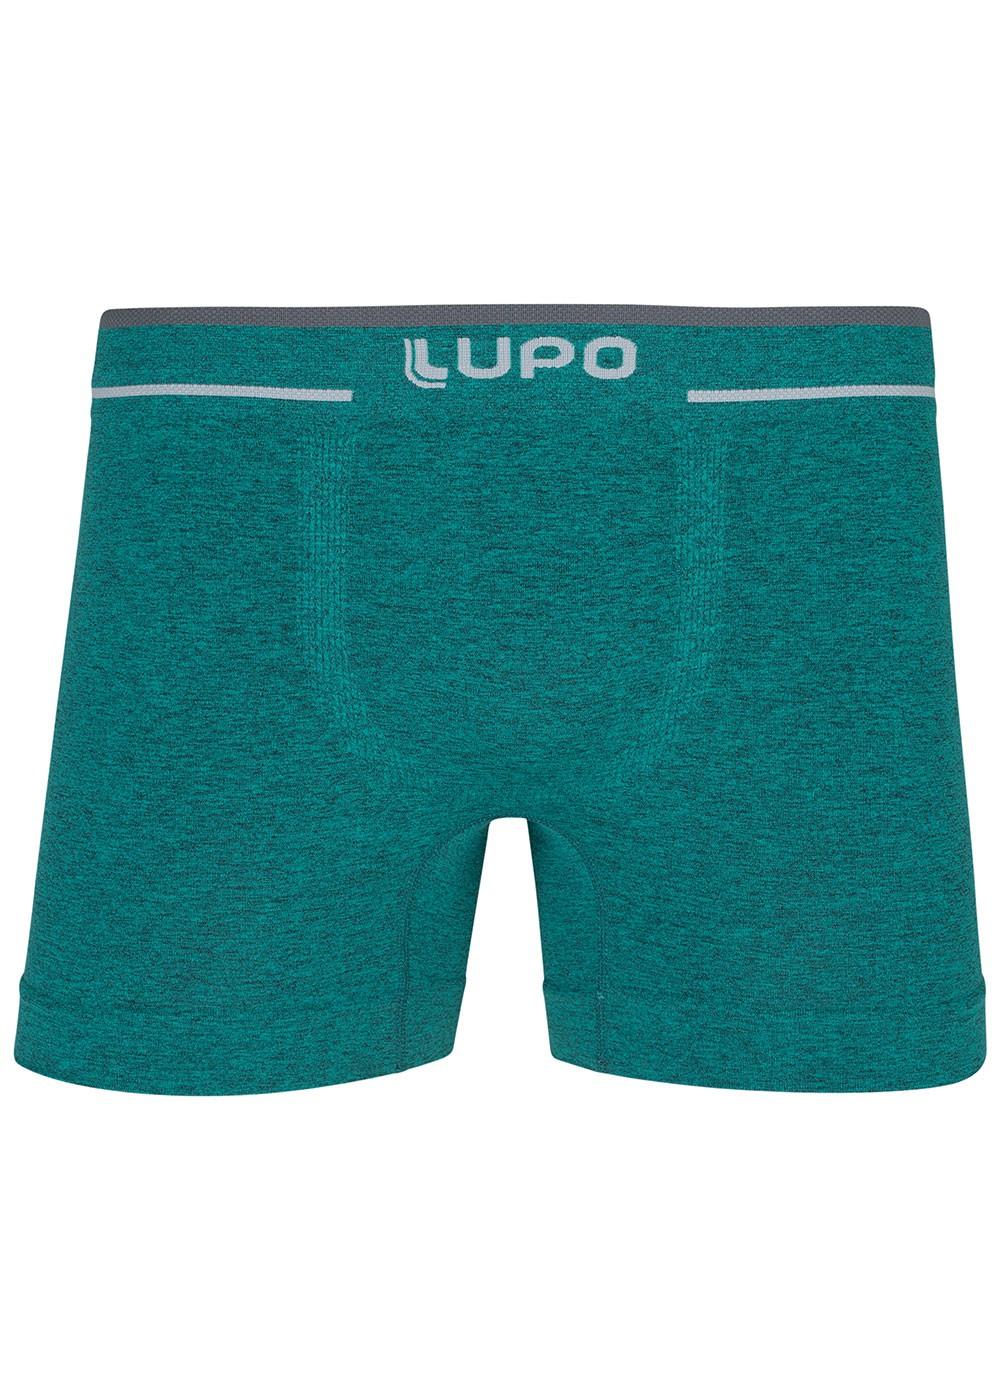 Cueca Infantil Boxer Microfibra Verde Lupo